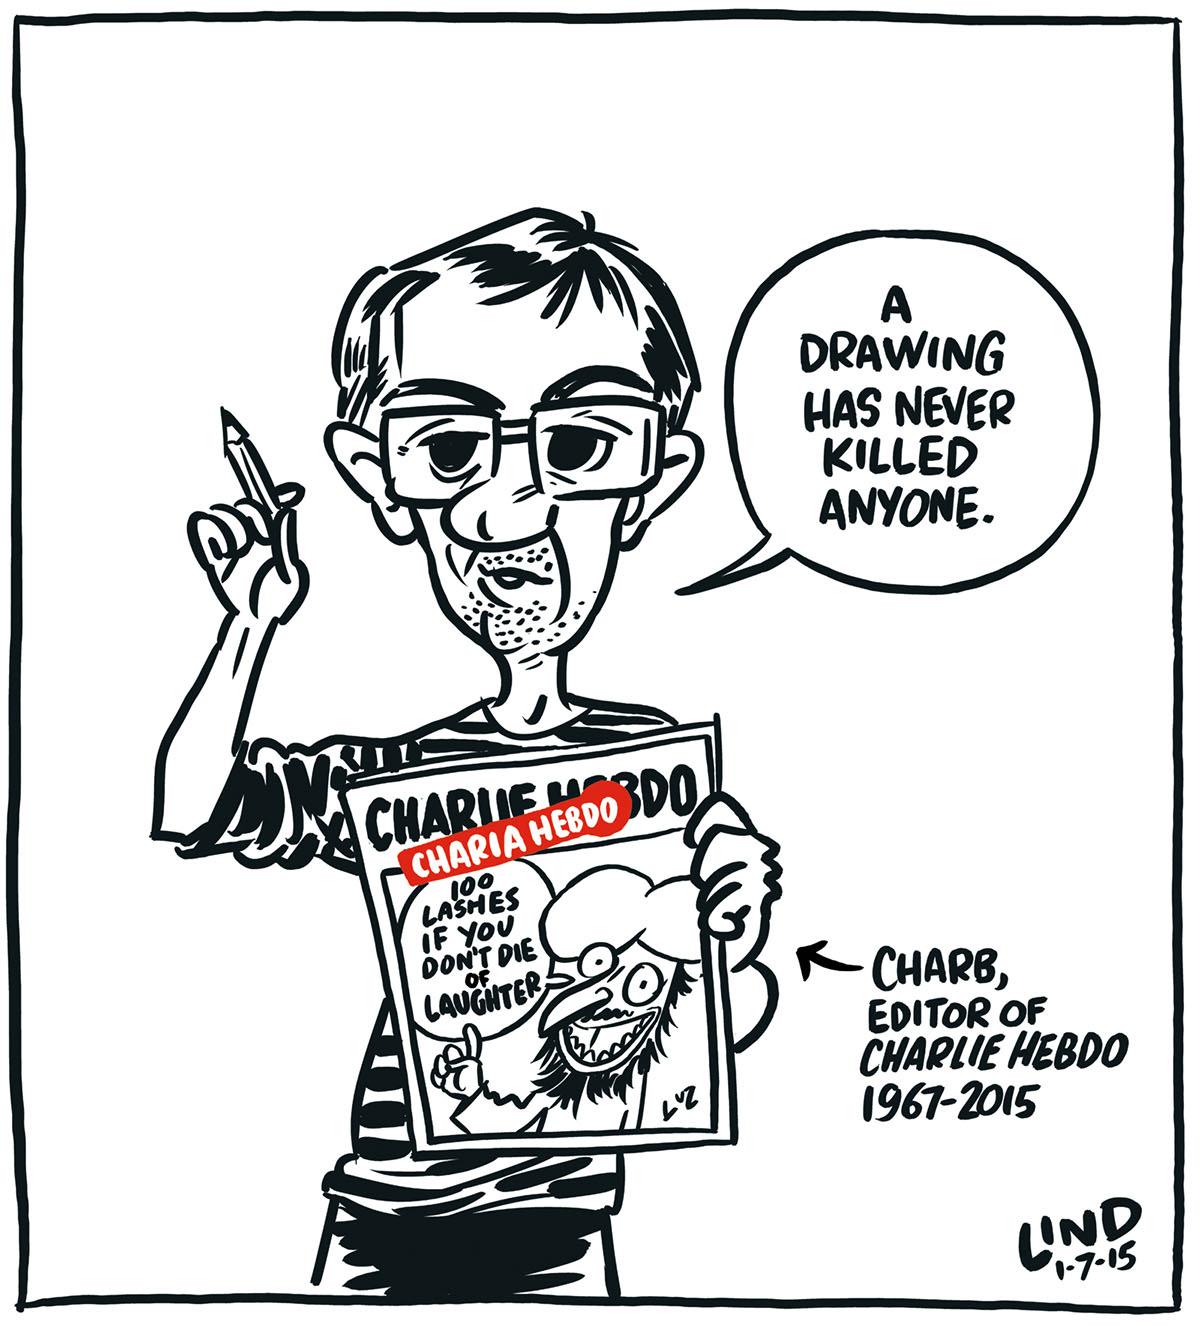 Lind_Charb_CharlieHebdo_sm